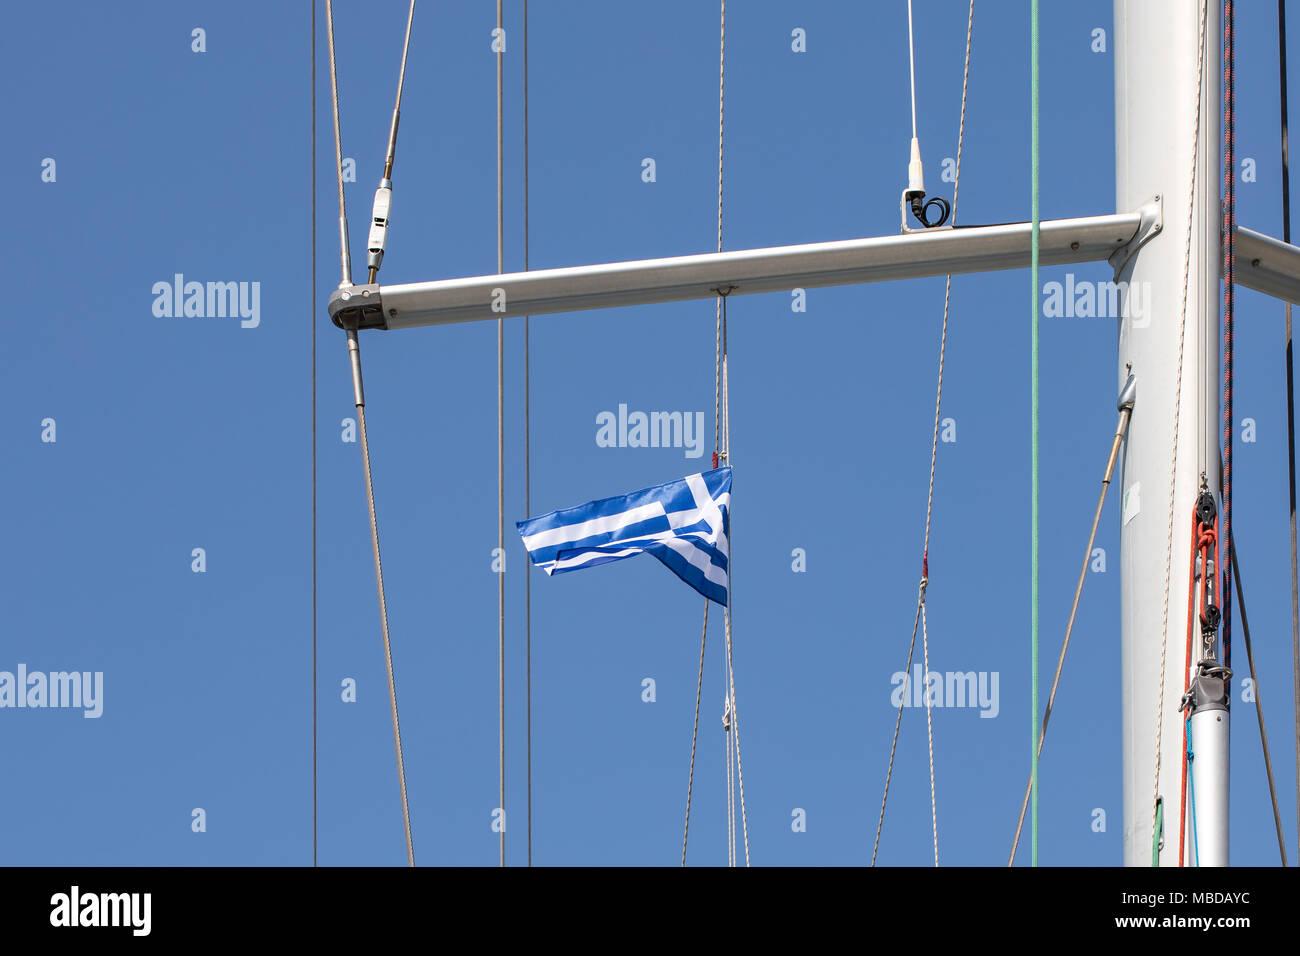 Greek flag on yacht on a shroud under spreader. White and blue ...